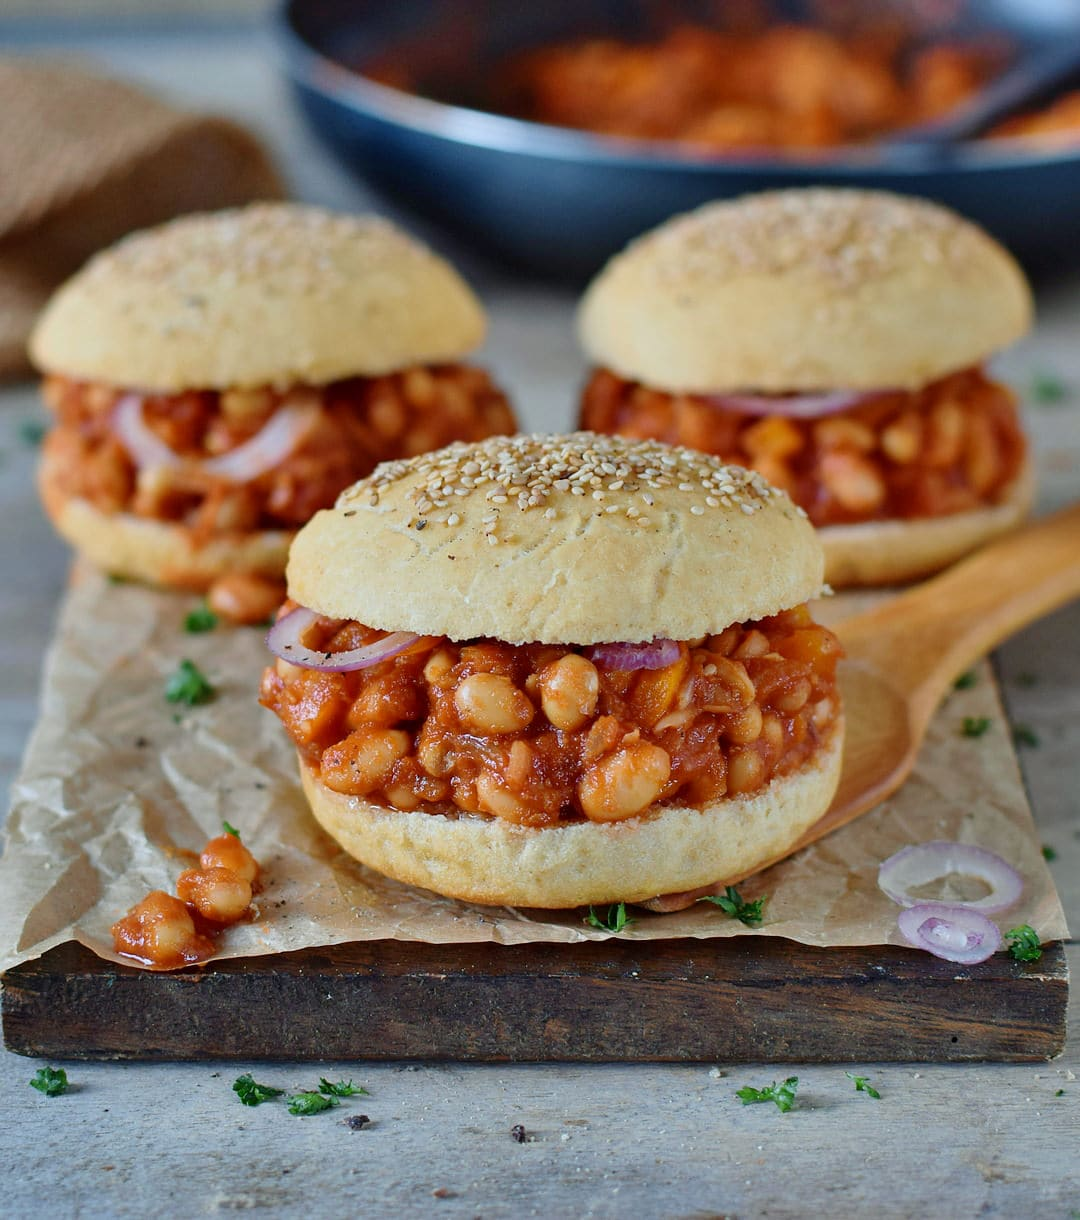 vegan sloppy joes with soft gluten-free burger buns